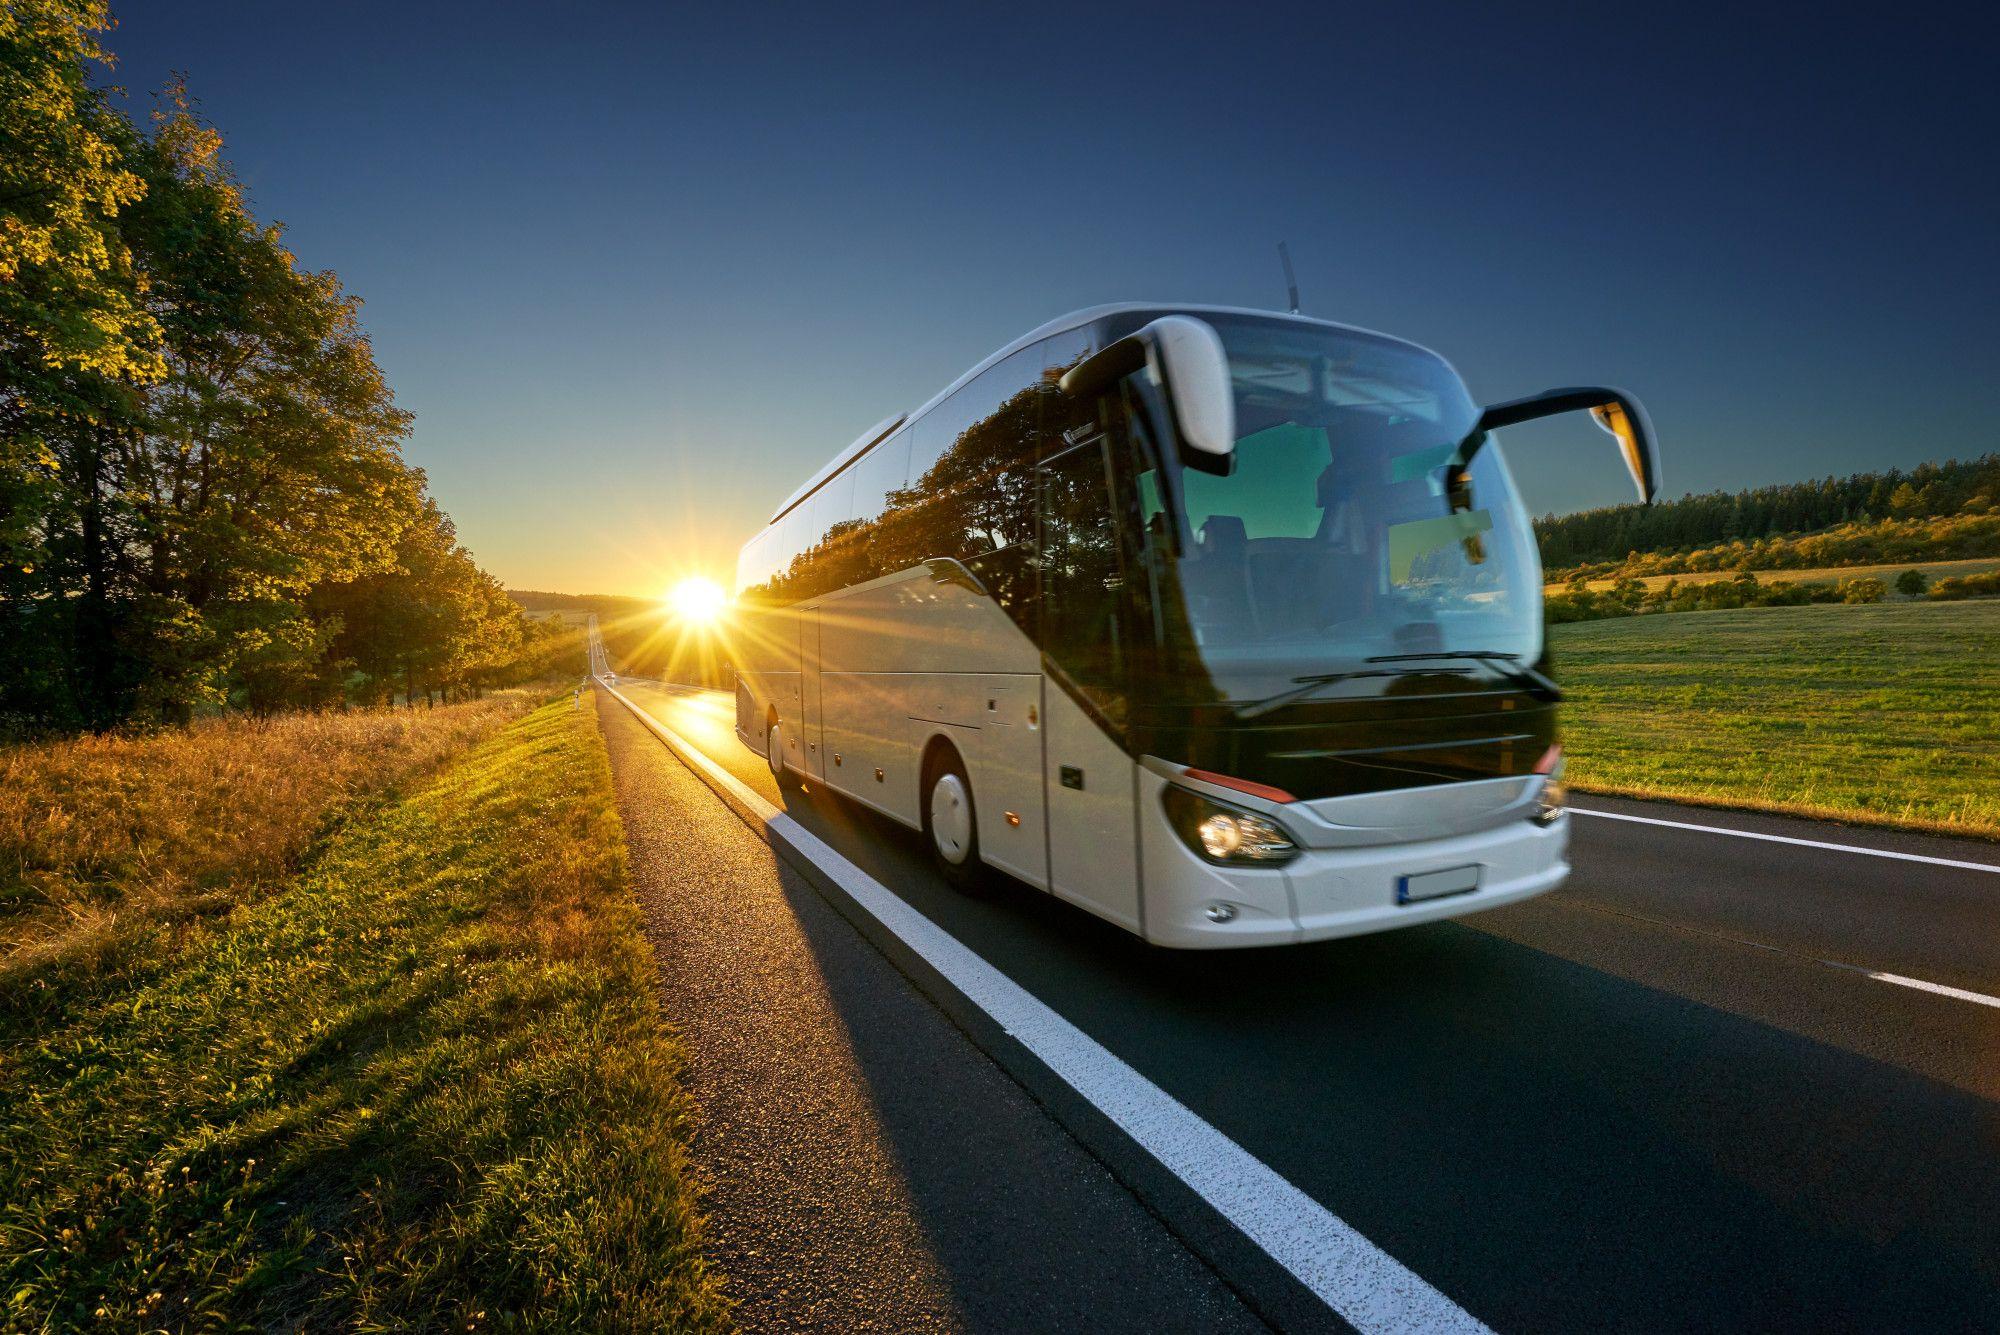 autocar-autobus 3124